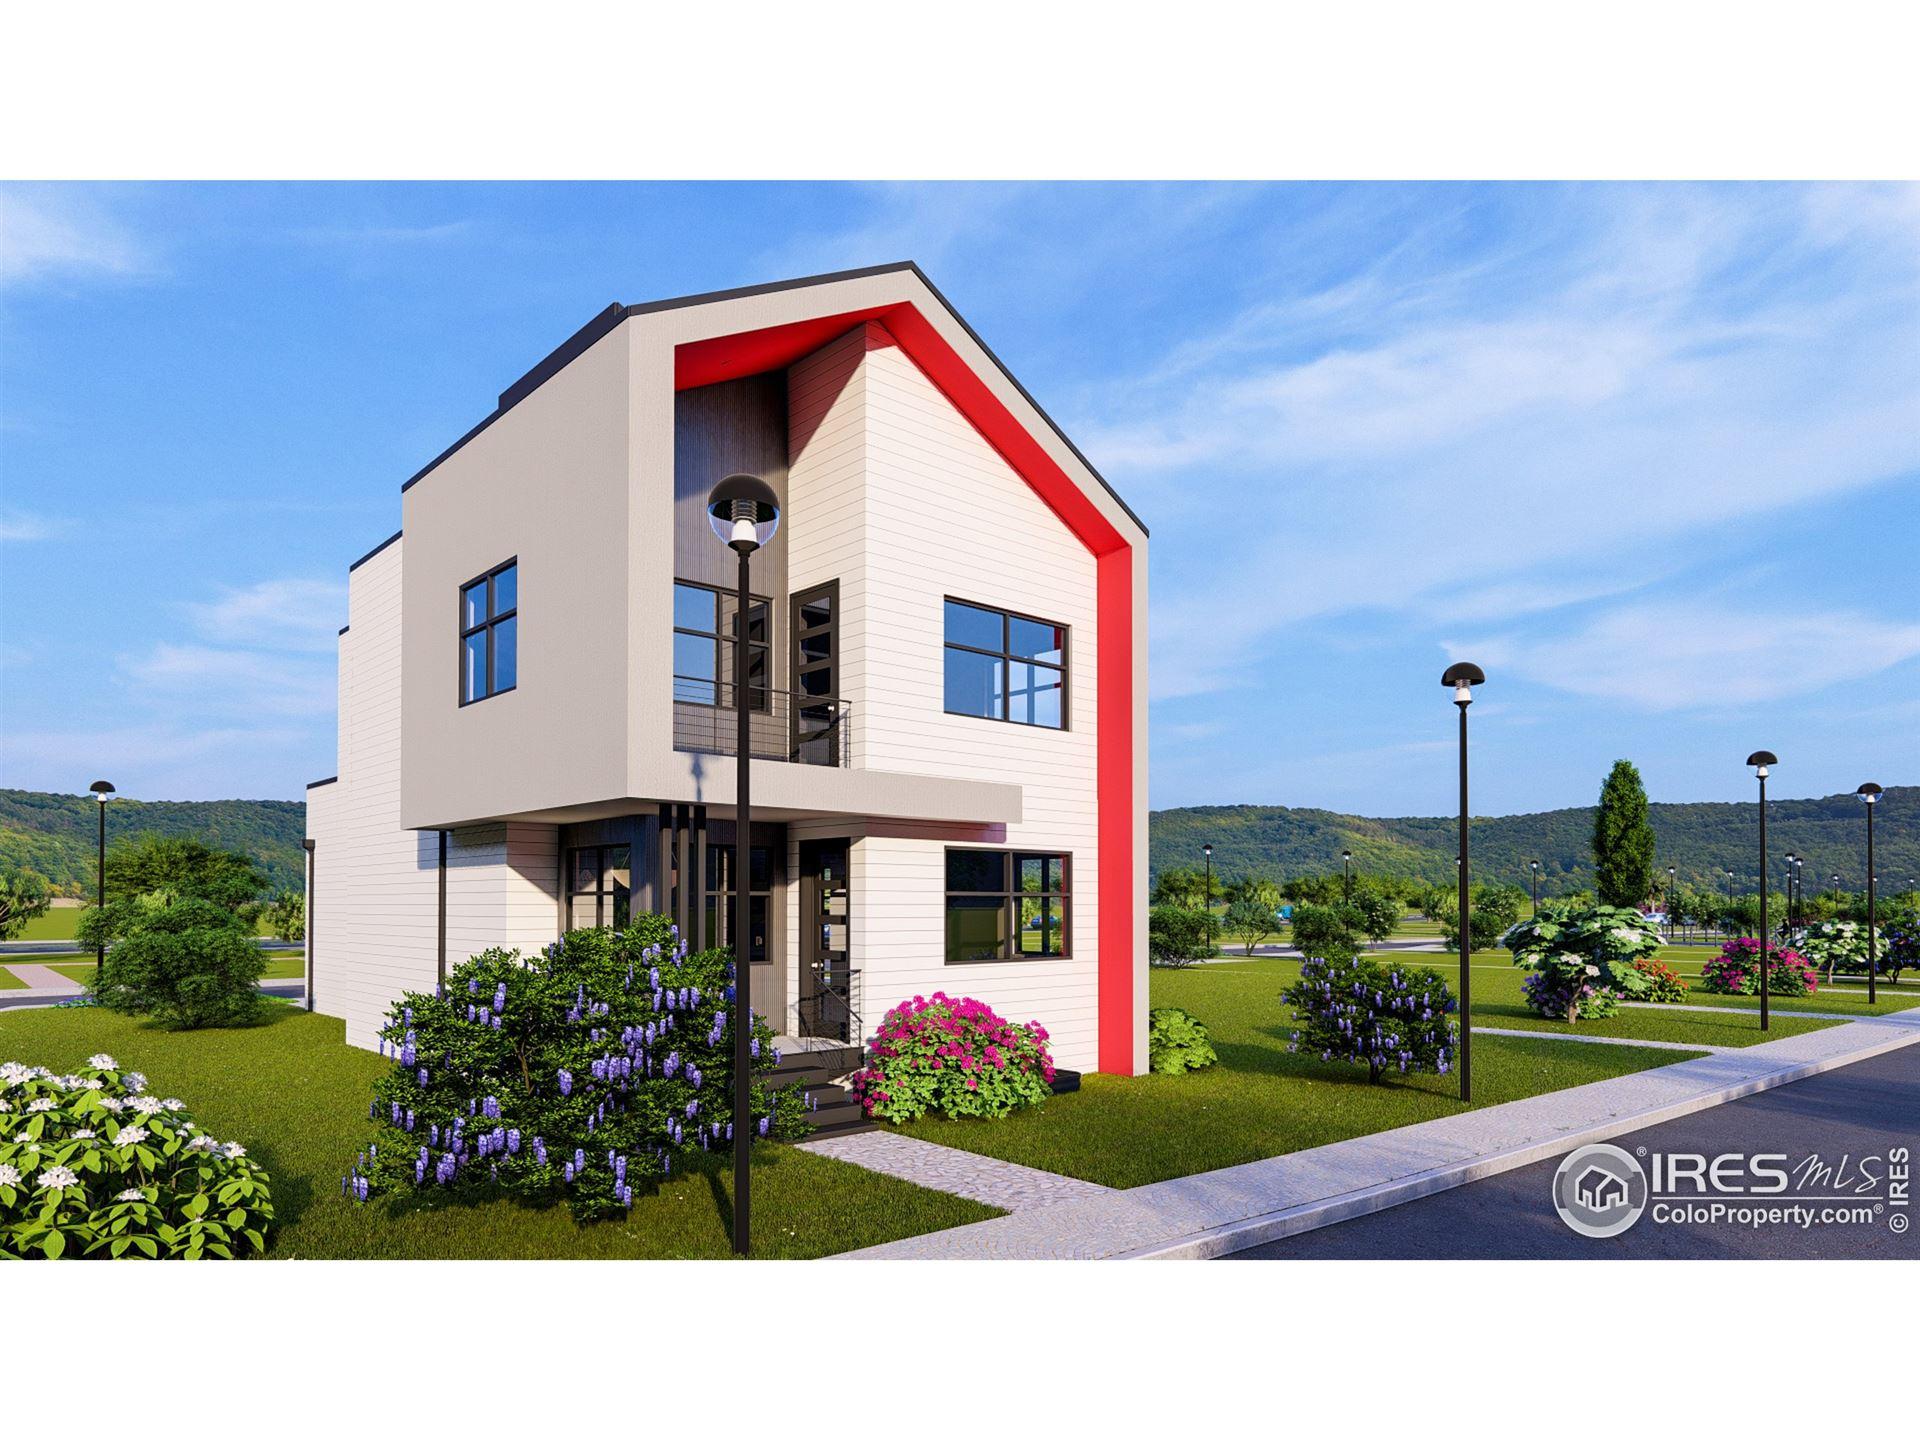 380 Osiander St, Fort Collins, CO 80524 - #: 945250